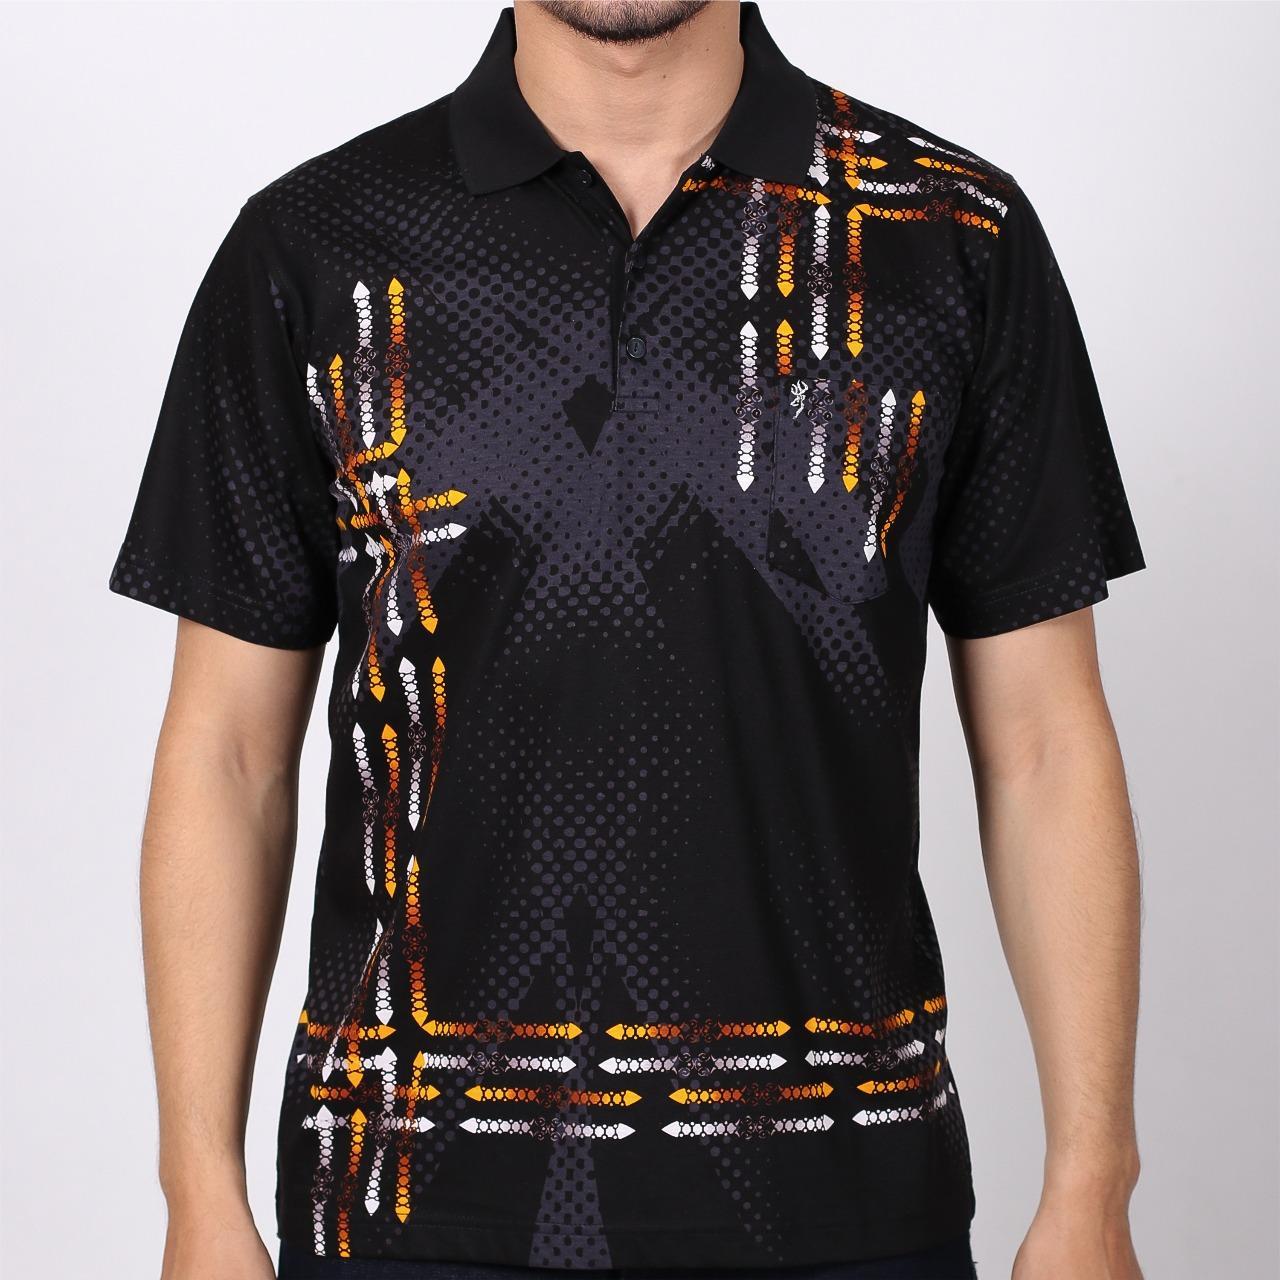 Kaos Polo Pria Cressida Original Polo Shirt Cowok Regular Hitam Lengan Pendek CBWP.7P013-6A